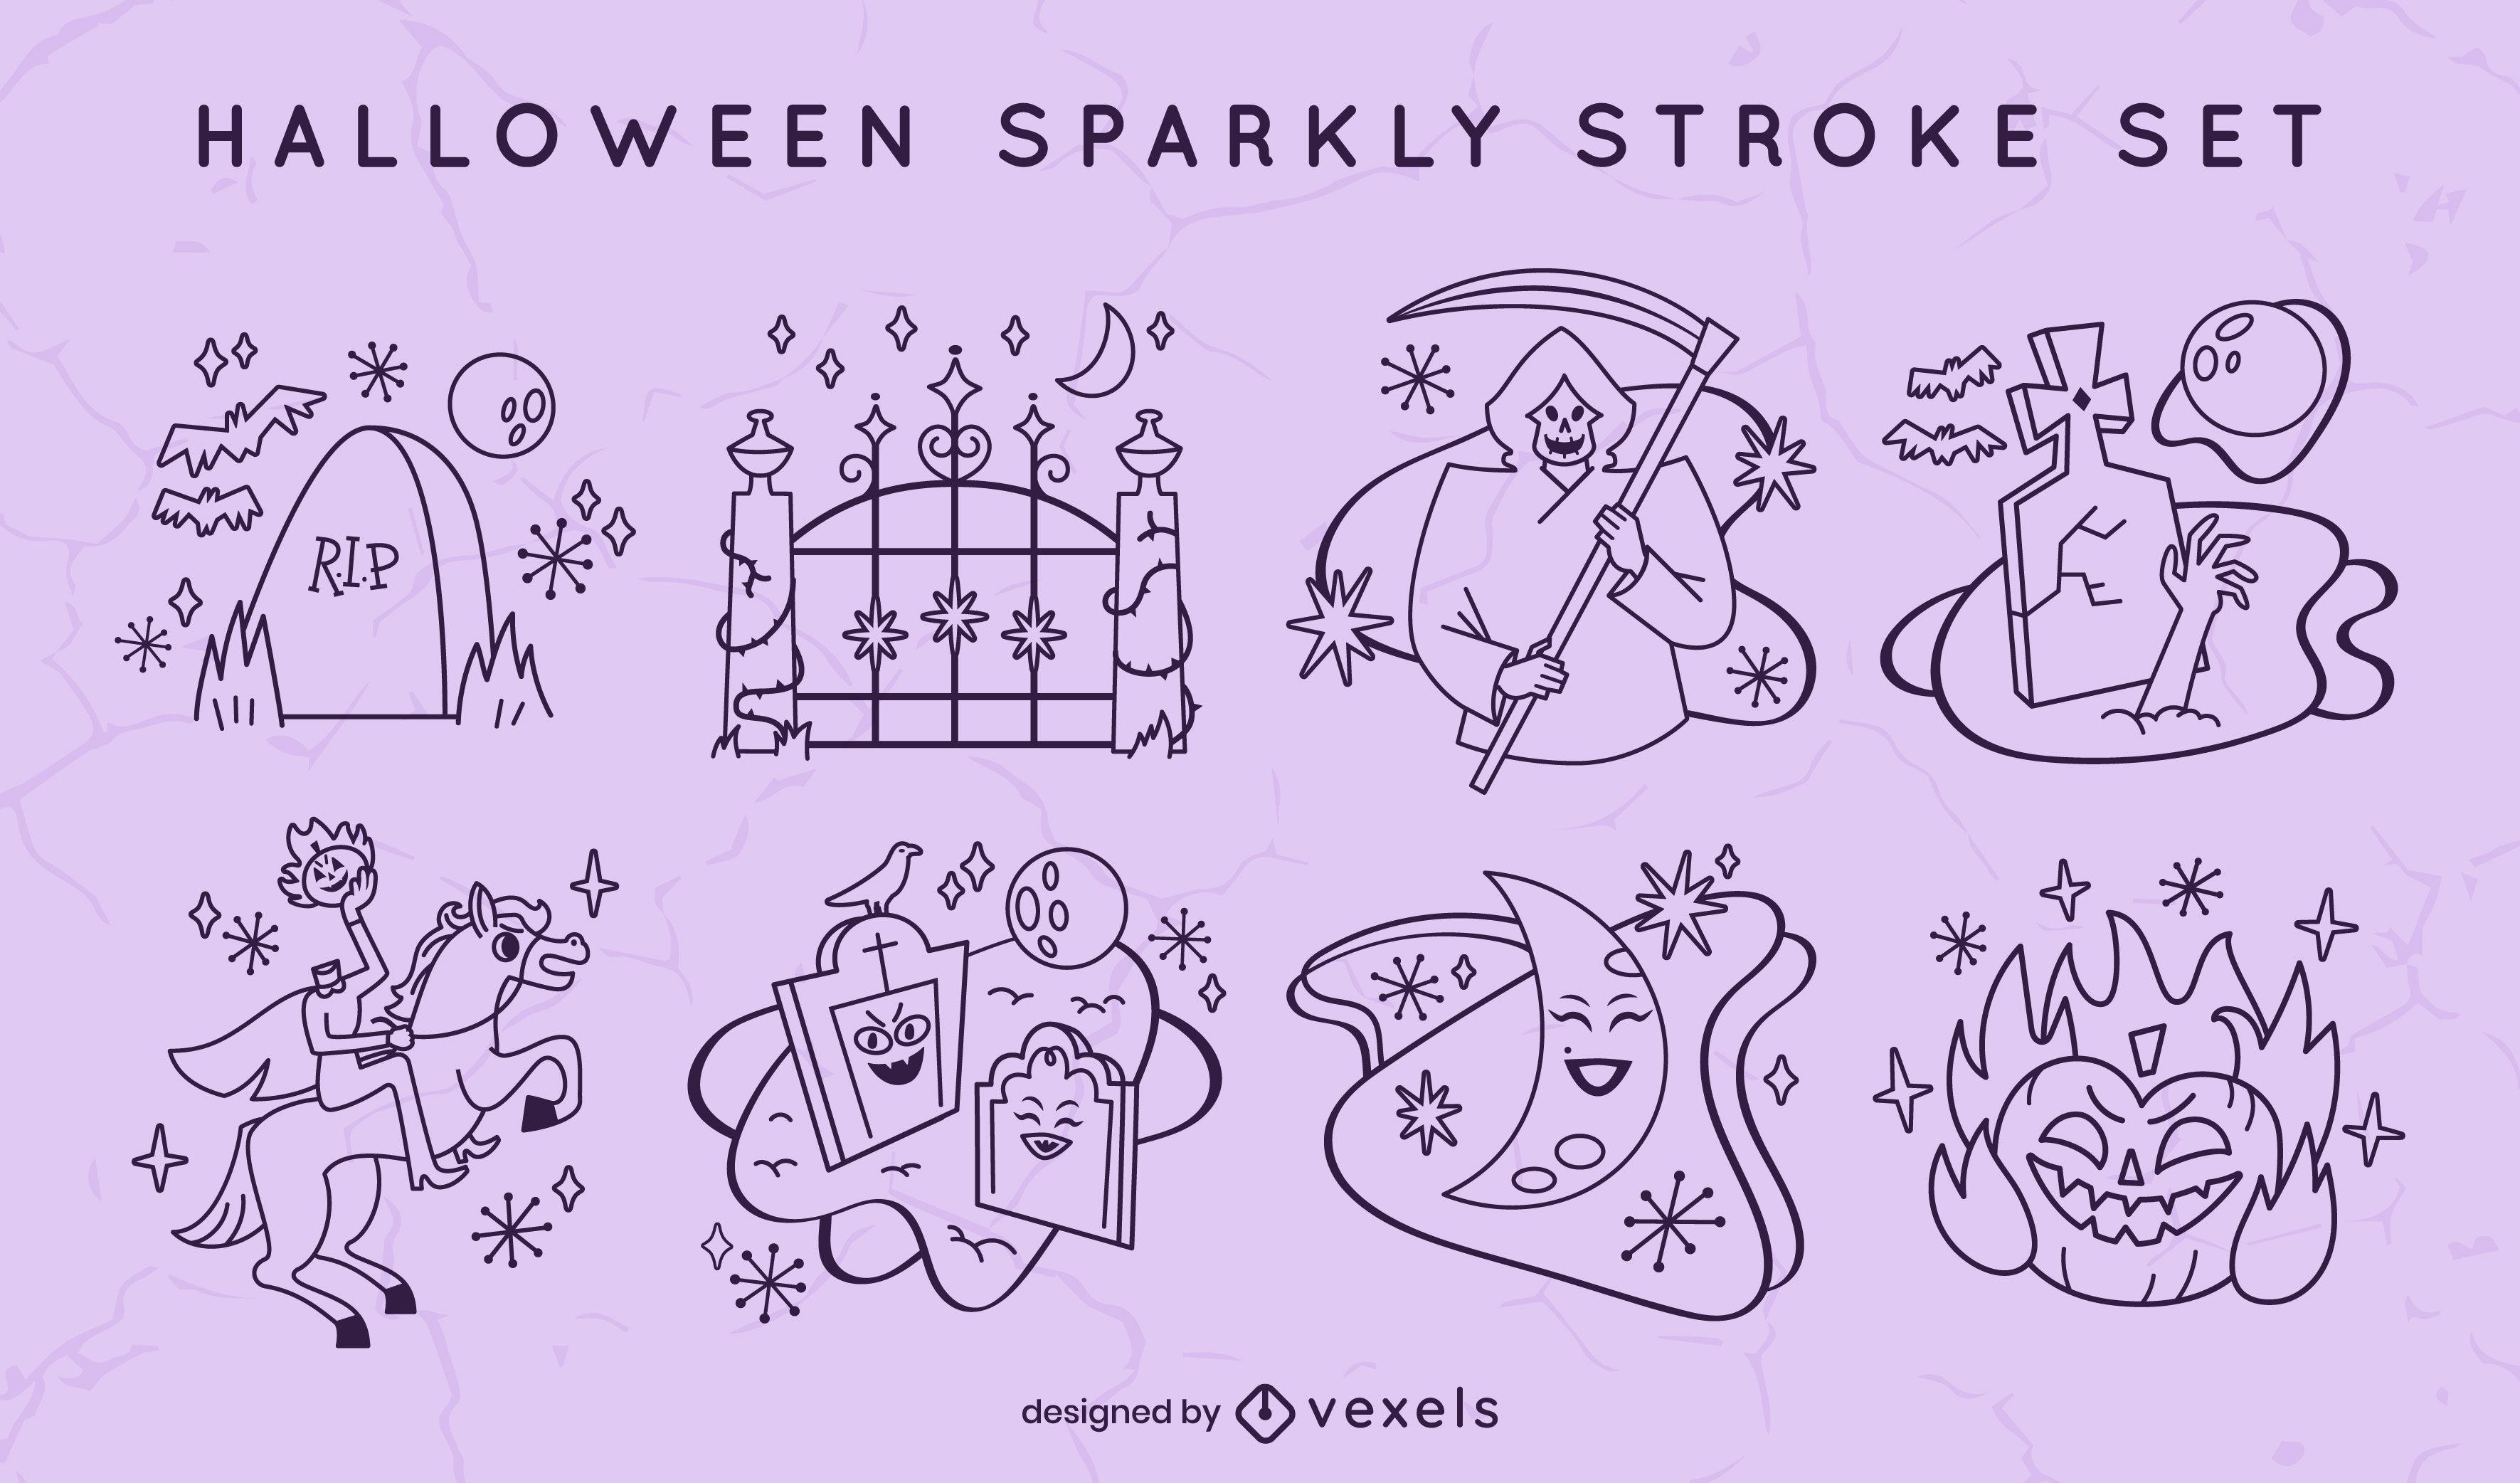 Halloween holiday graveyard spooky stroke set